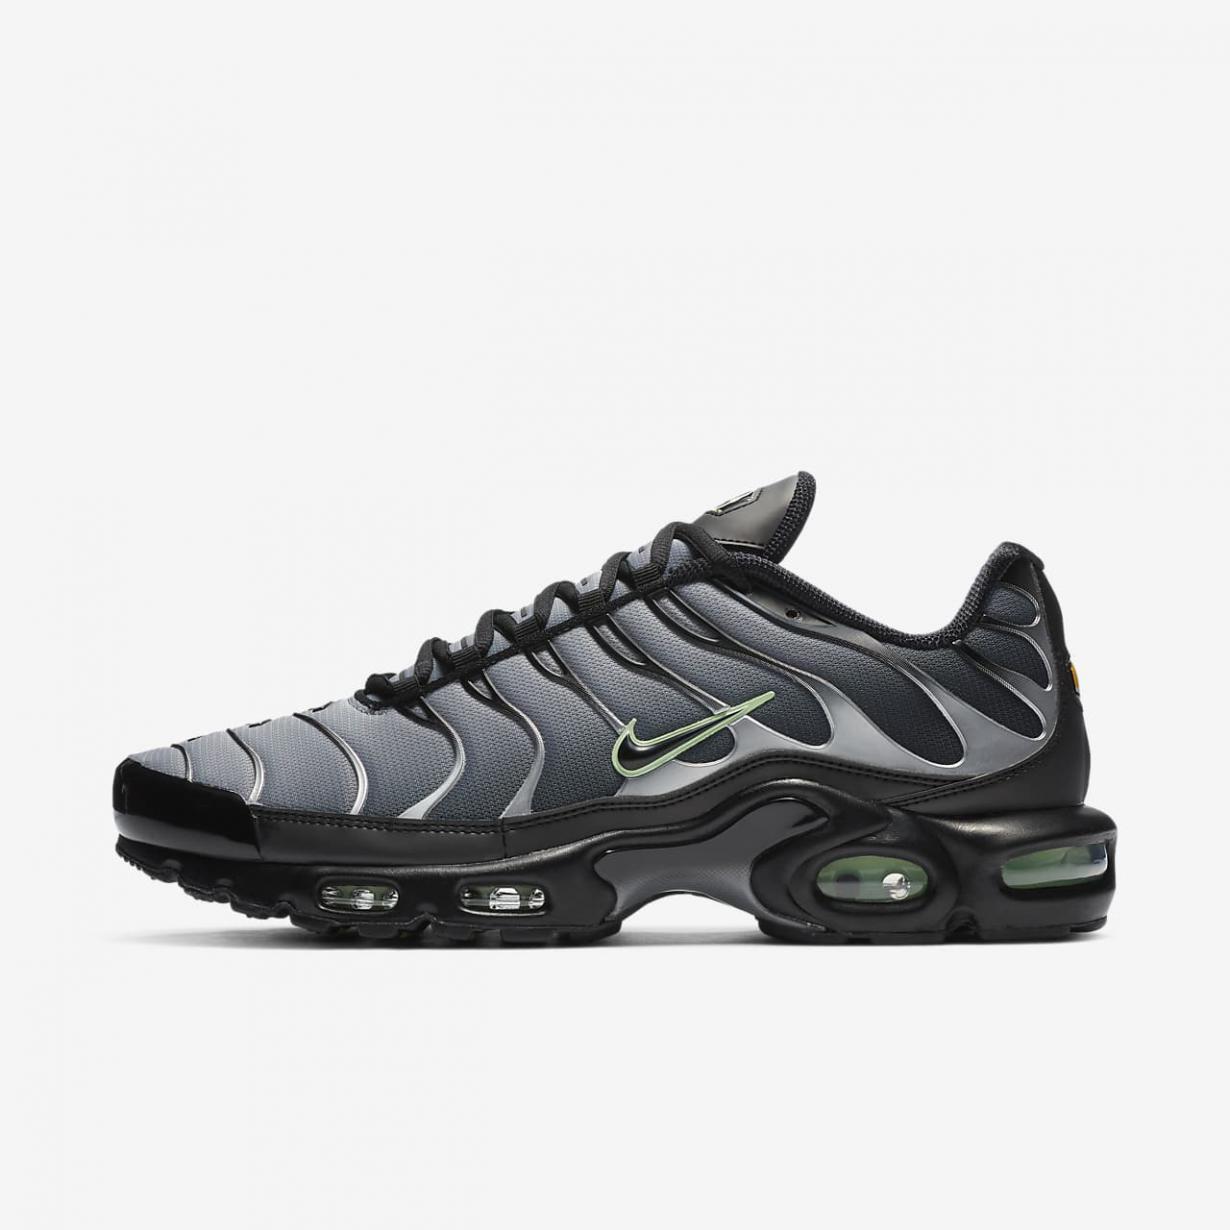 Vert vapeur < Nike En Ligne Pas Cher Vente - FR < Gooddaytricities